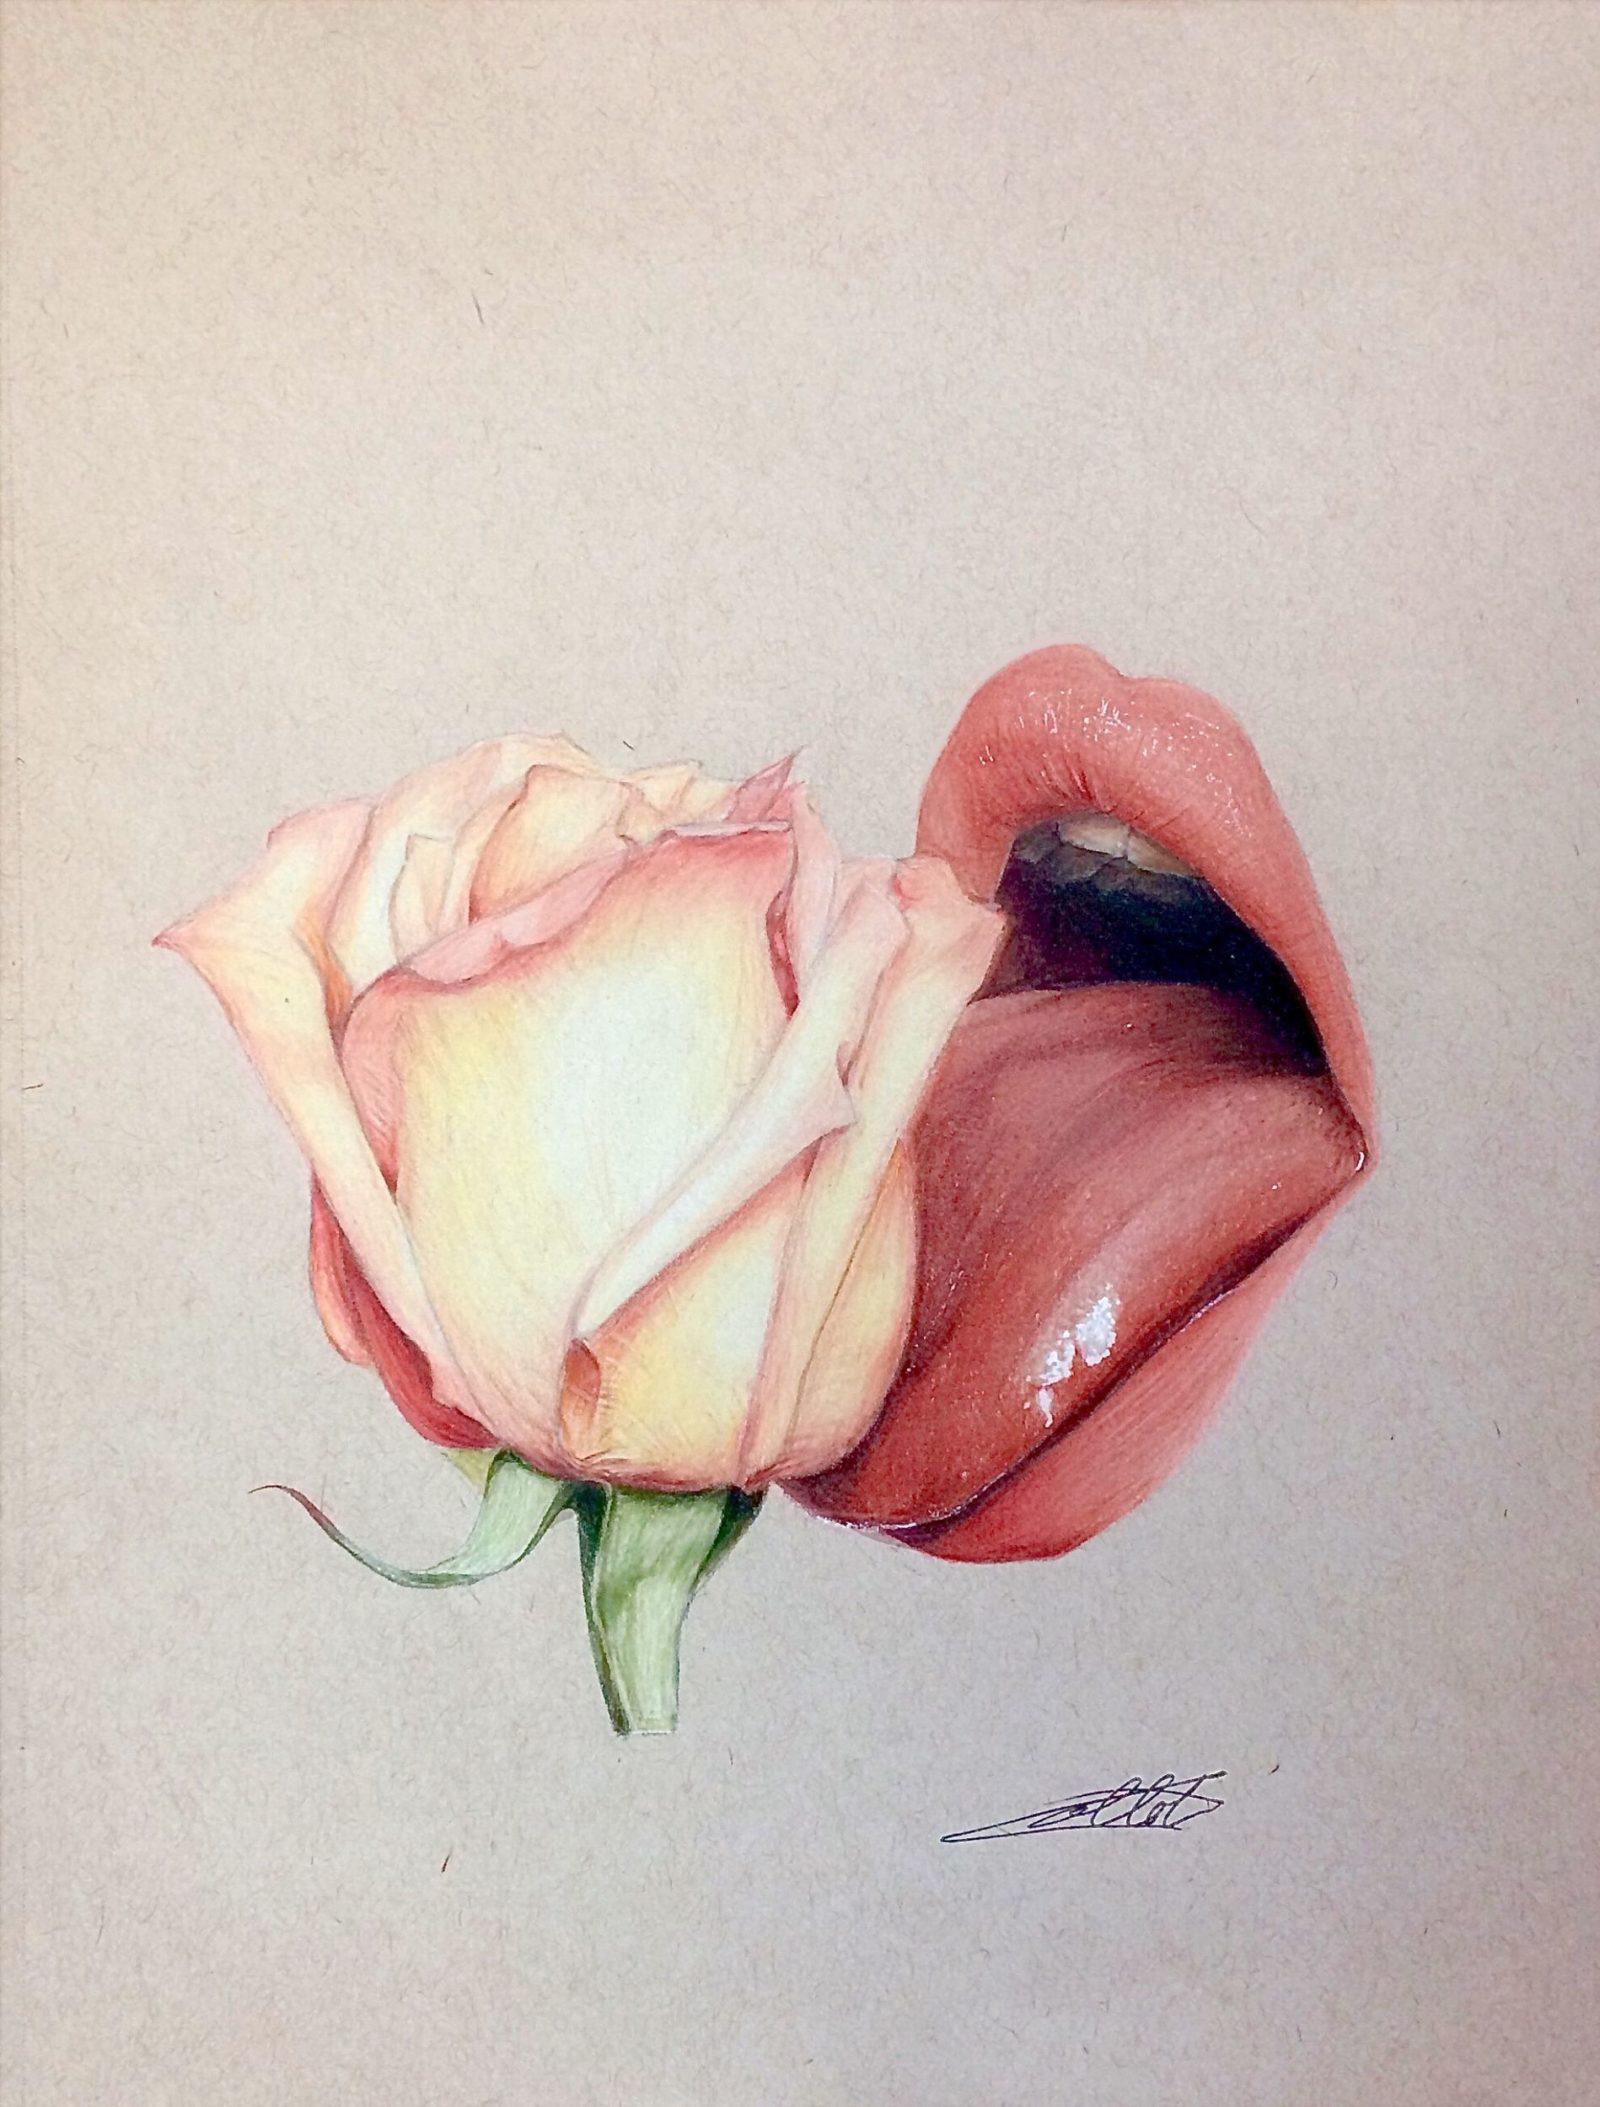 COLLOT Grégoire - The Lick